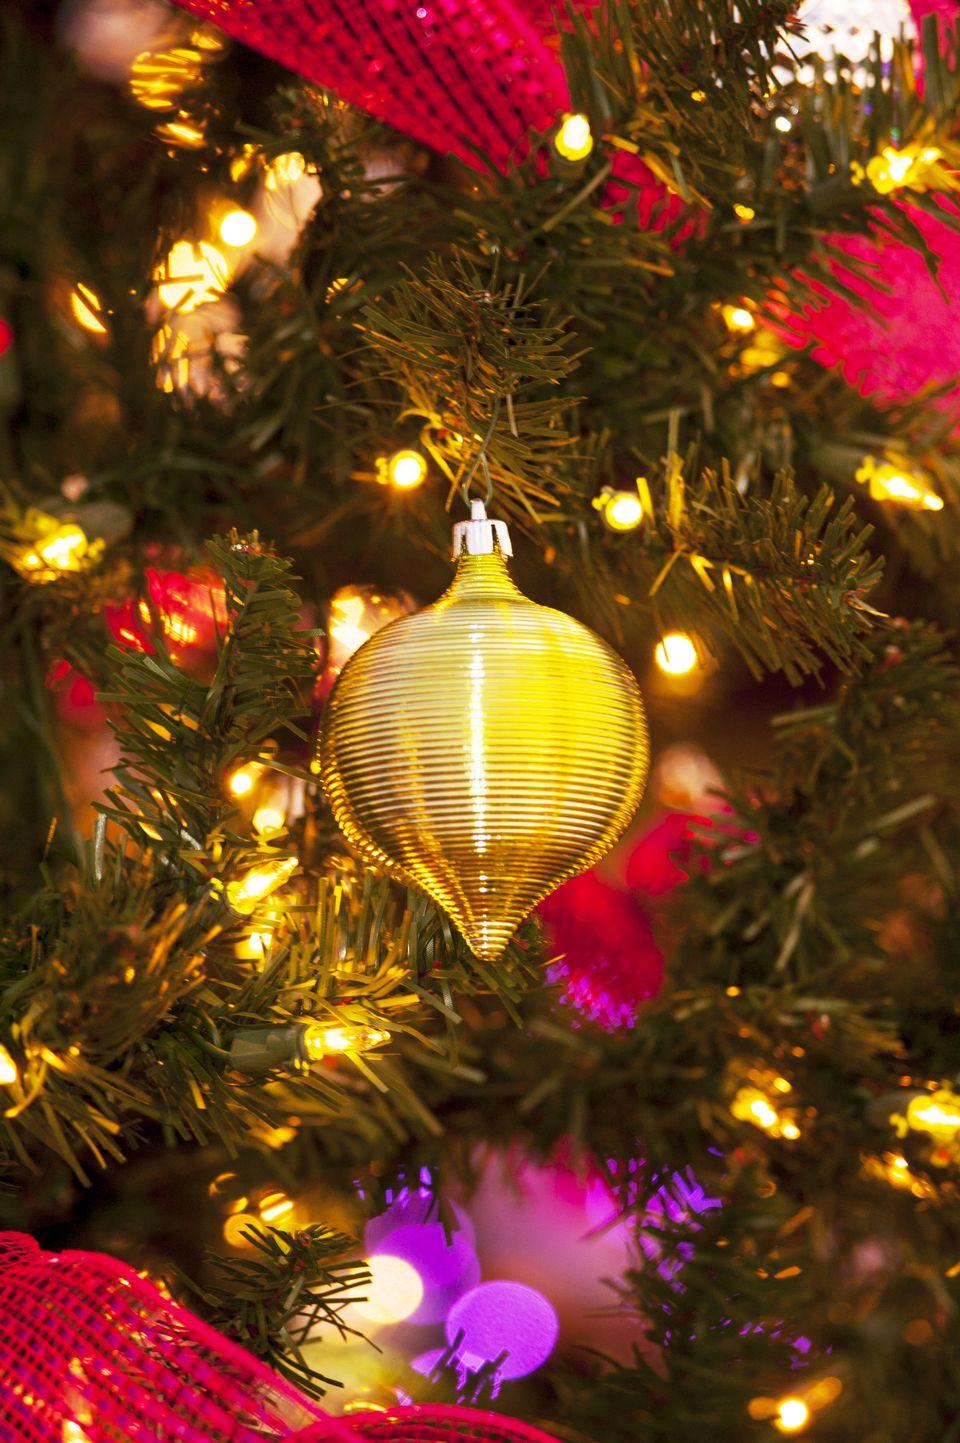 xmas tree and baublesjpg - Where To Buy A Christmas Tree